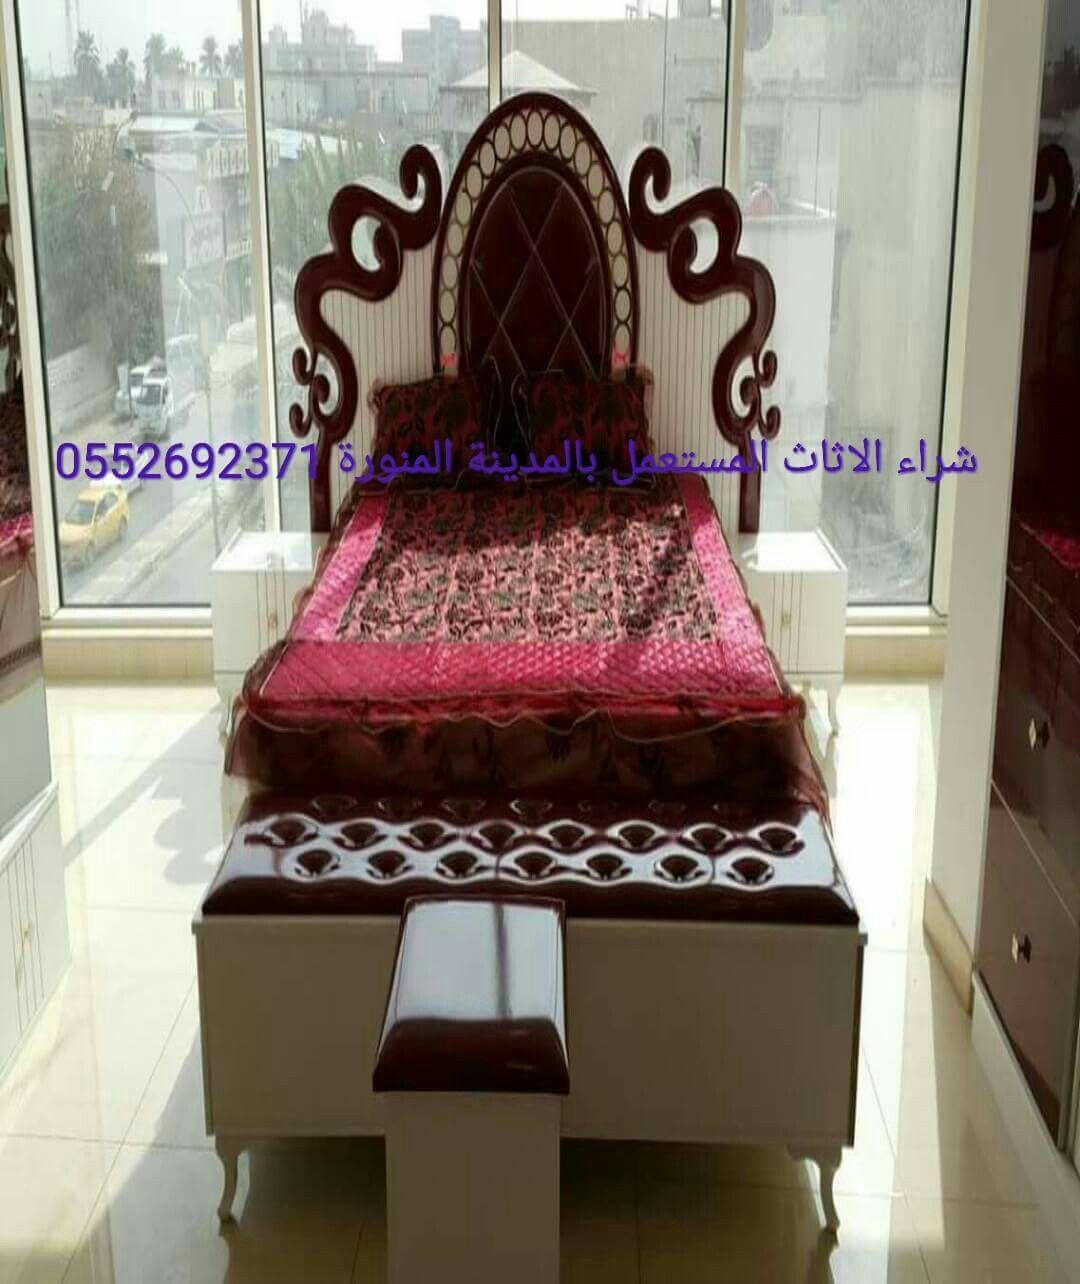 شراء الاثاث المستعمل بالمدينه المنورة Home Decor Chaise Lounge Furniture